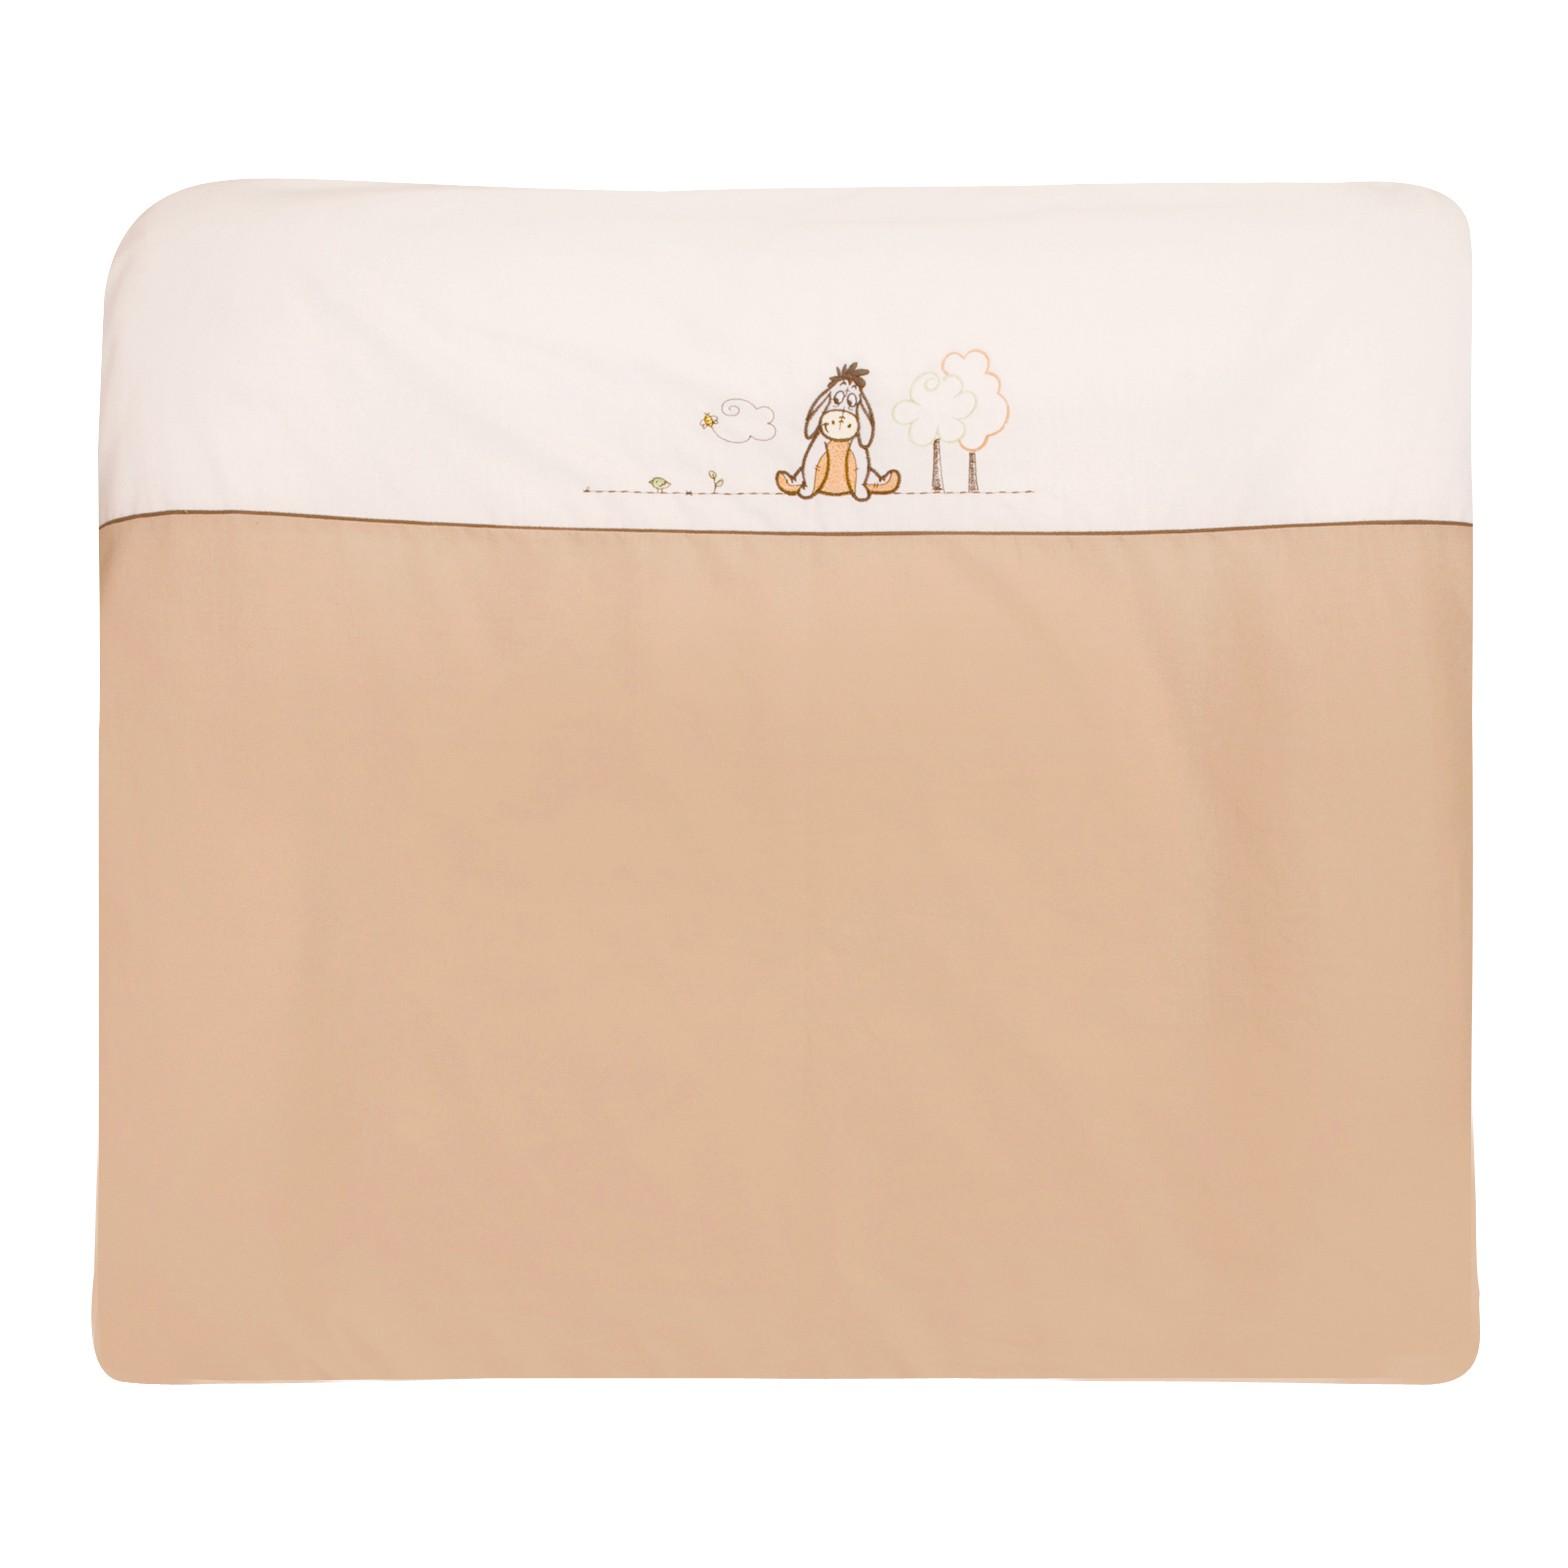 wickelauflagenbezug adorable pooh 100 baumwolle wei. Black Bedroom Furniture Sets. Home Design Ideas